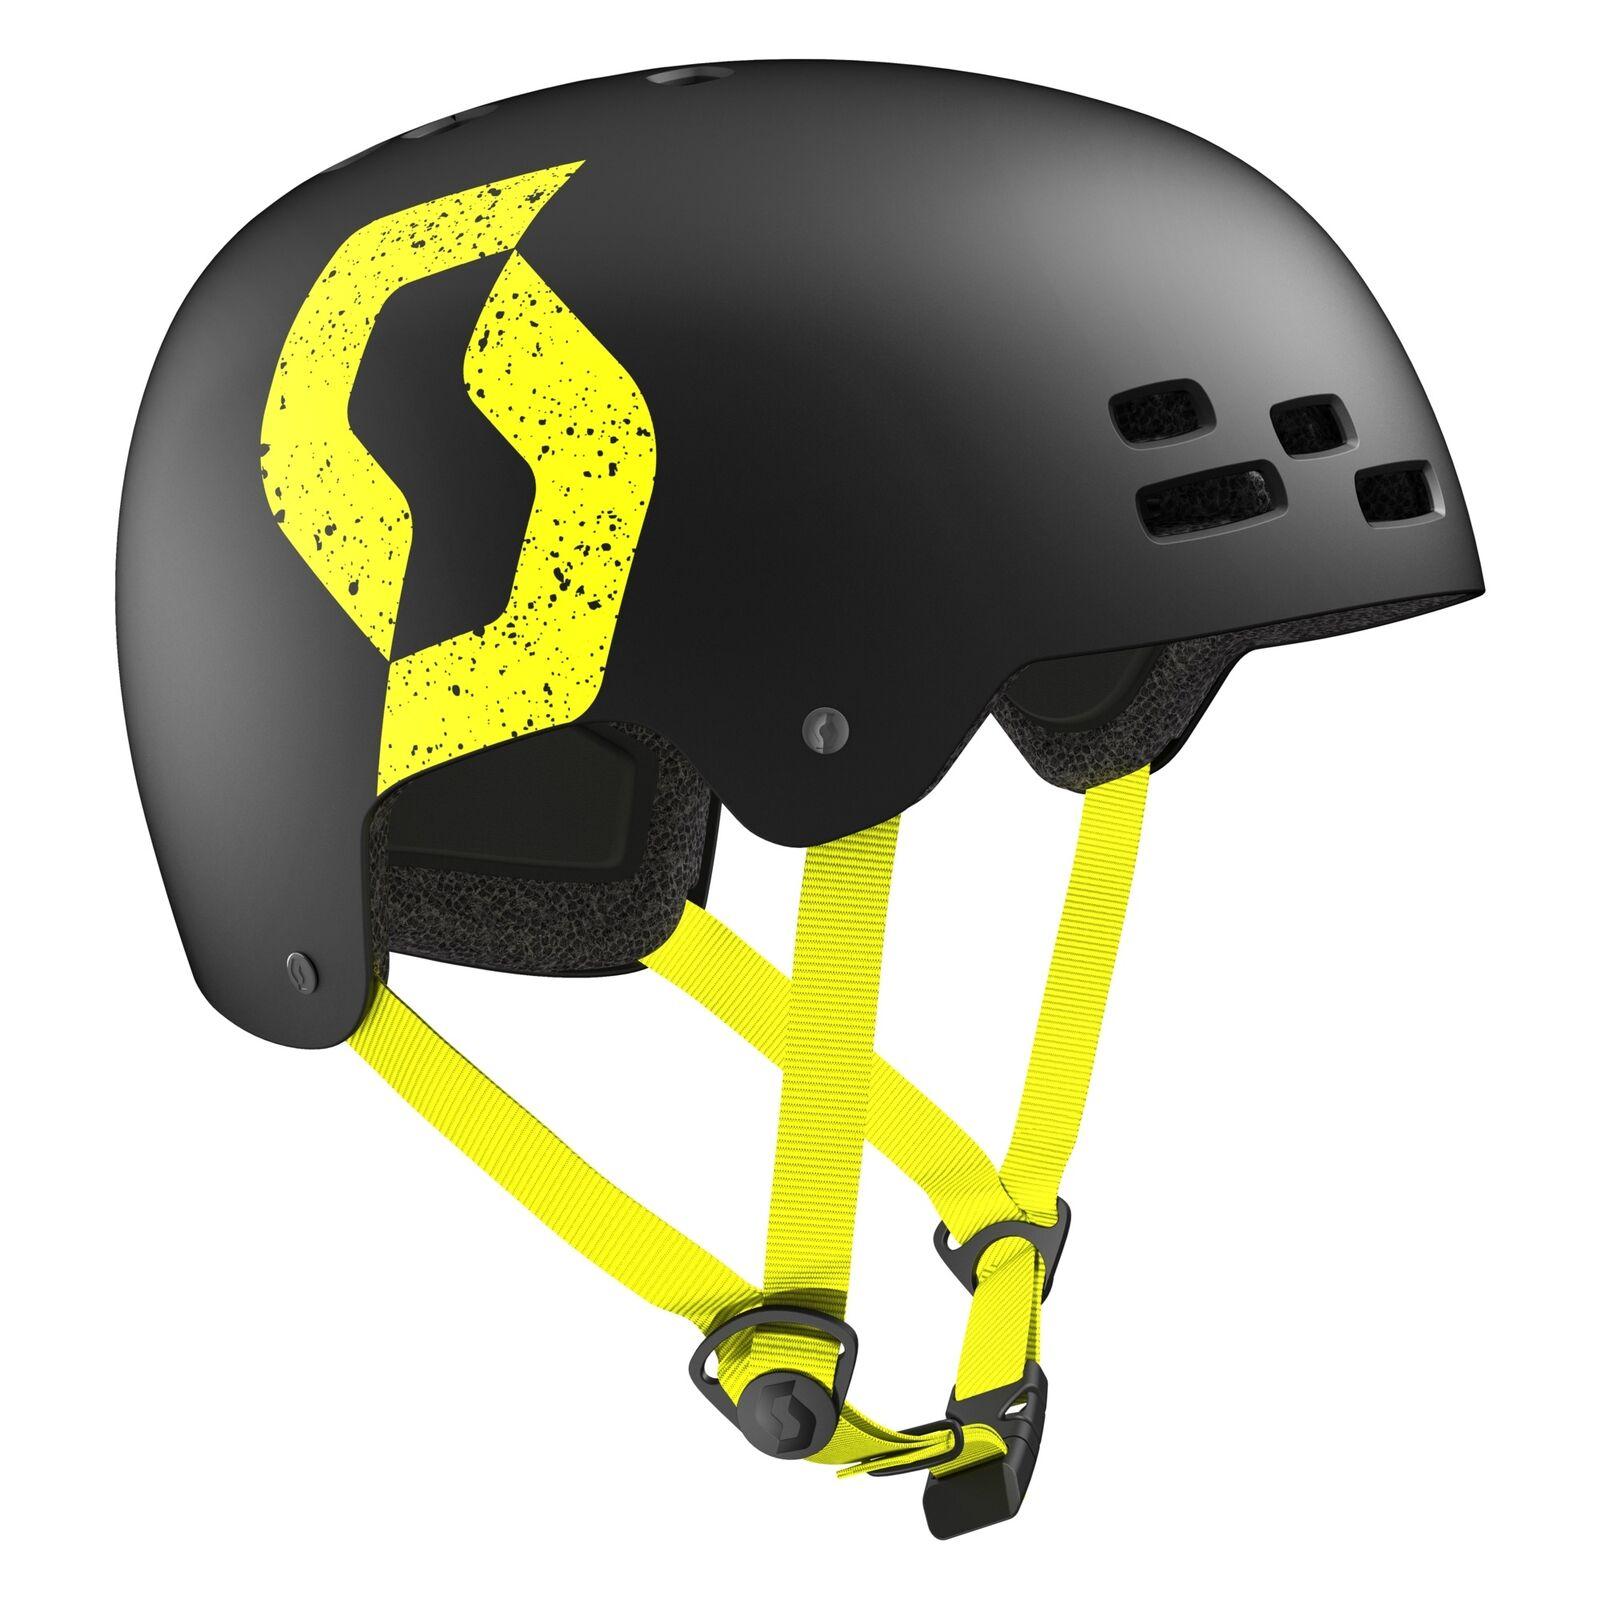 Scott Scott Scott Jibe Dirt Helm Schale schwarz gelb 2019 dc695f